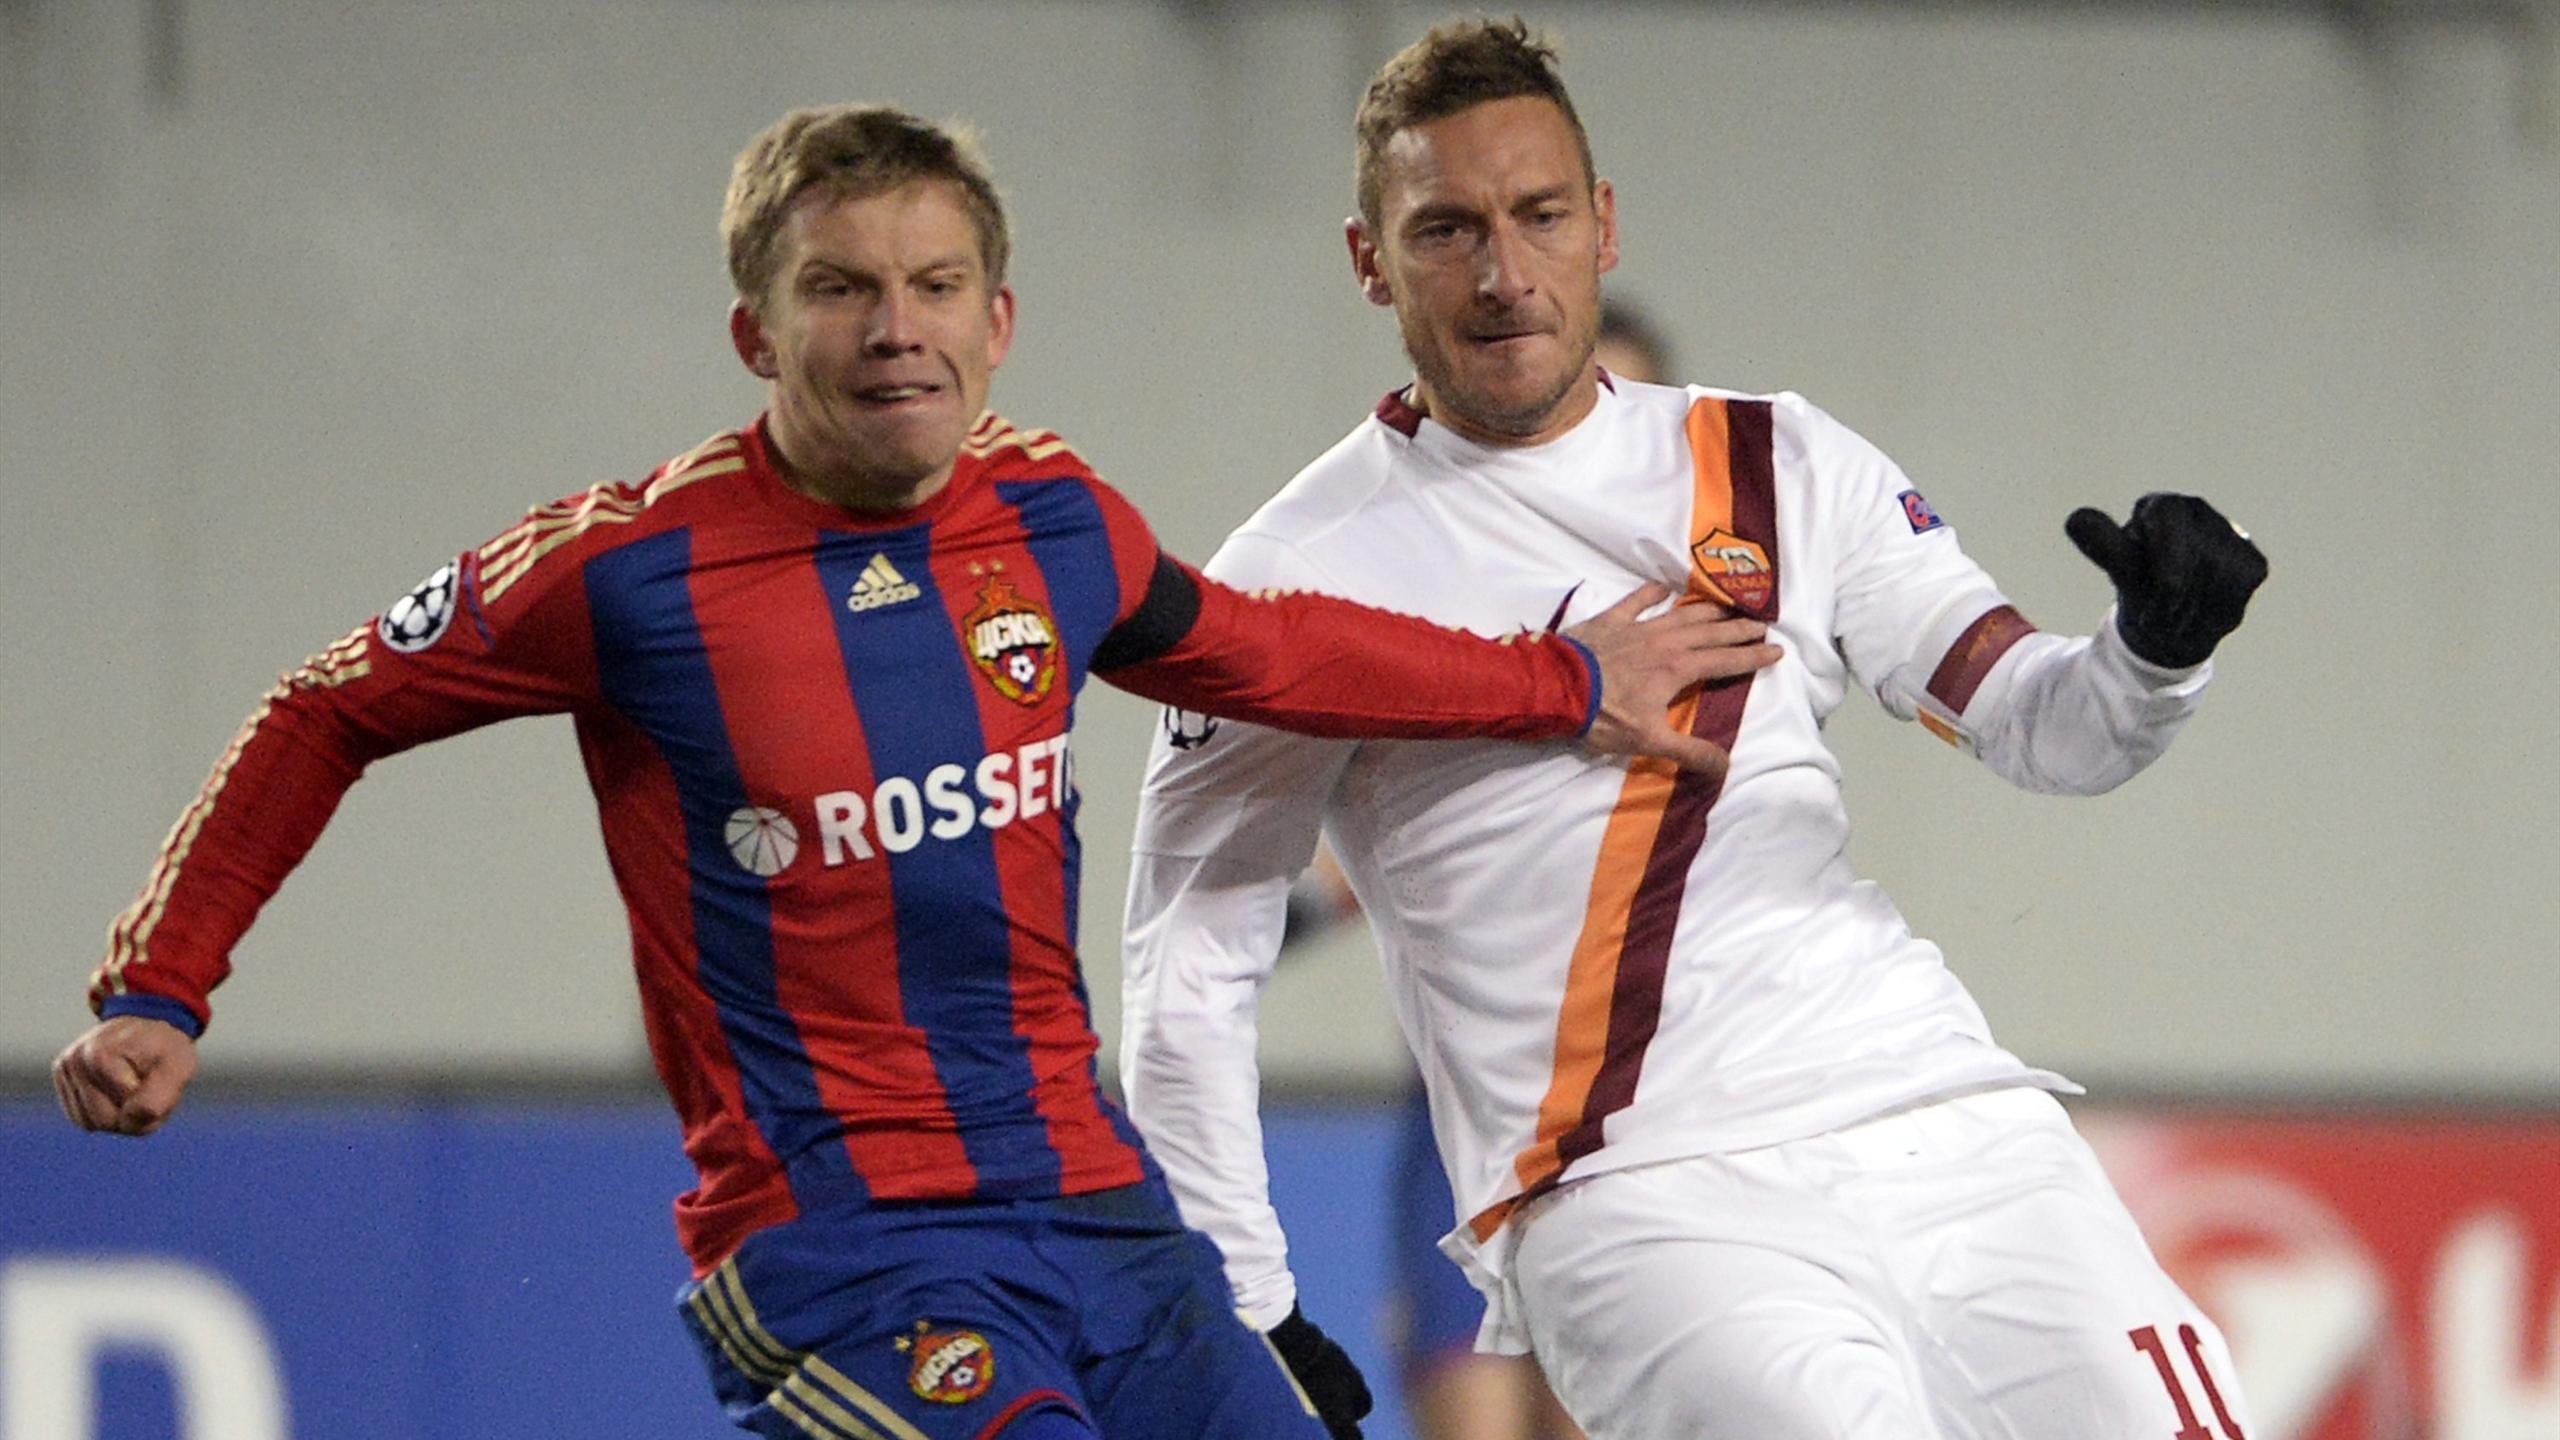 CSKA Moscow 1-1 Roma – Champions League (Group E) | Highlights